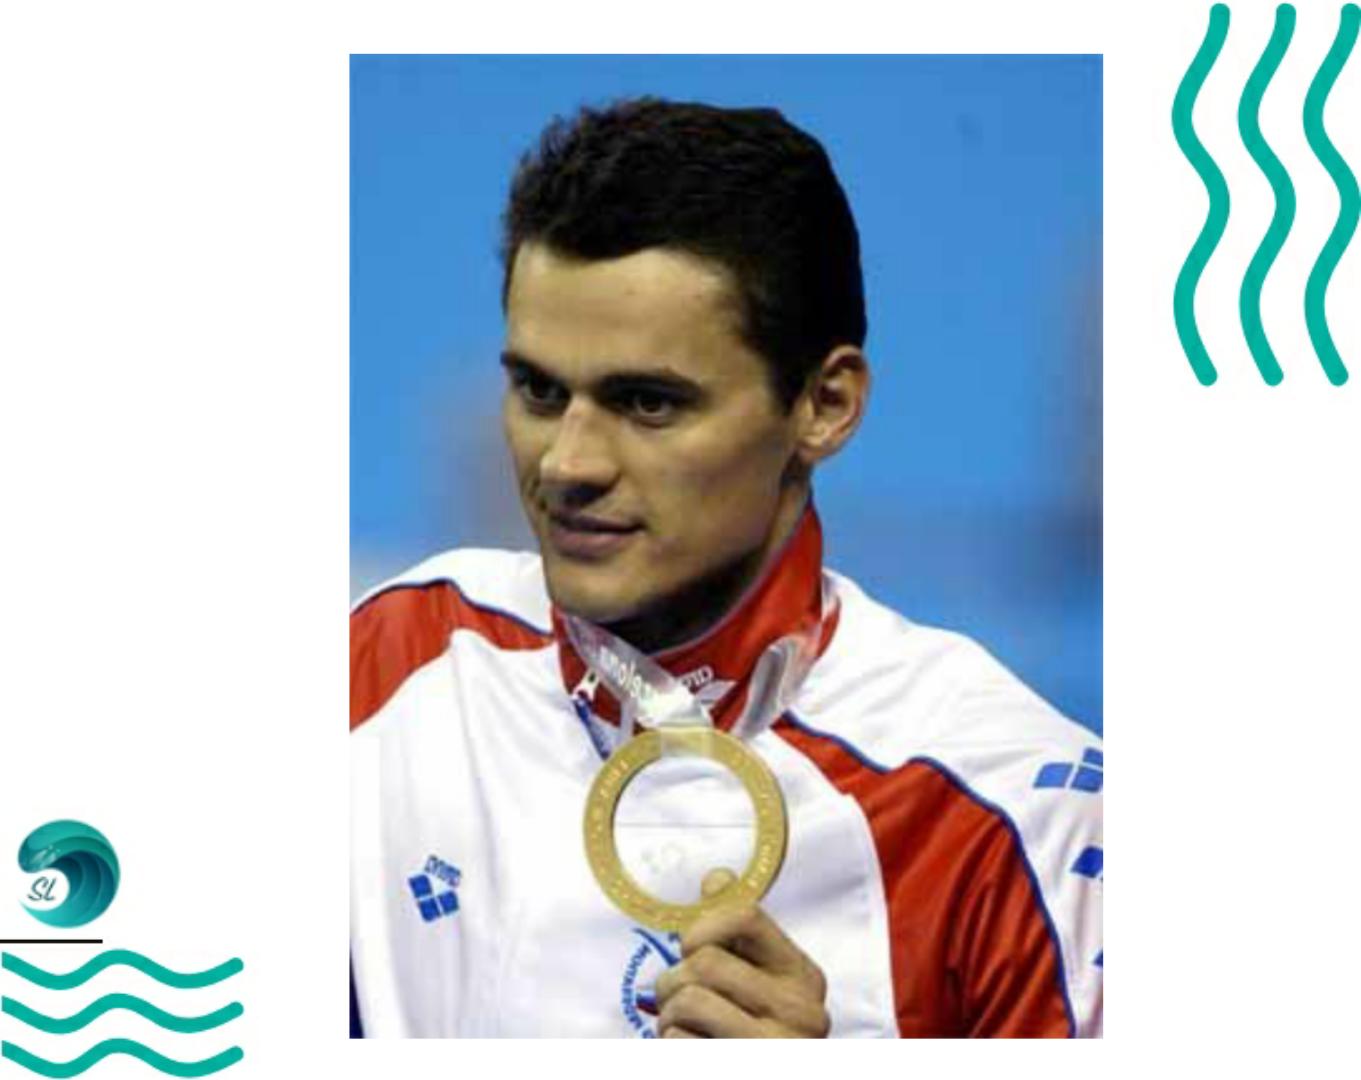 Александр Попов на Олимпиаде